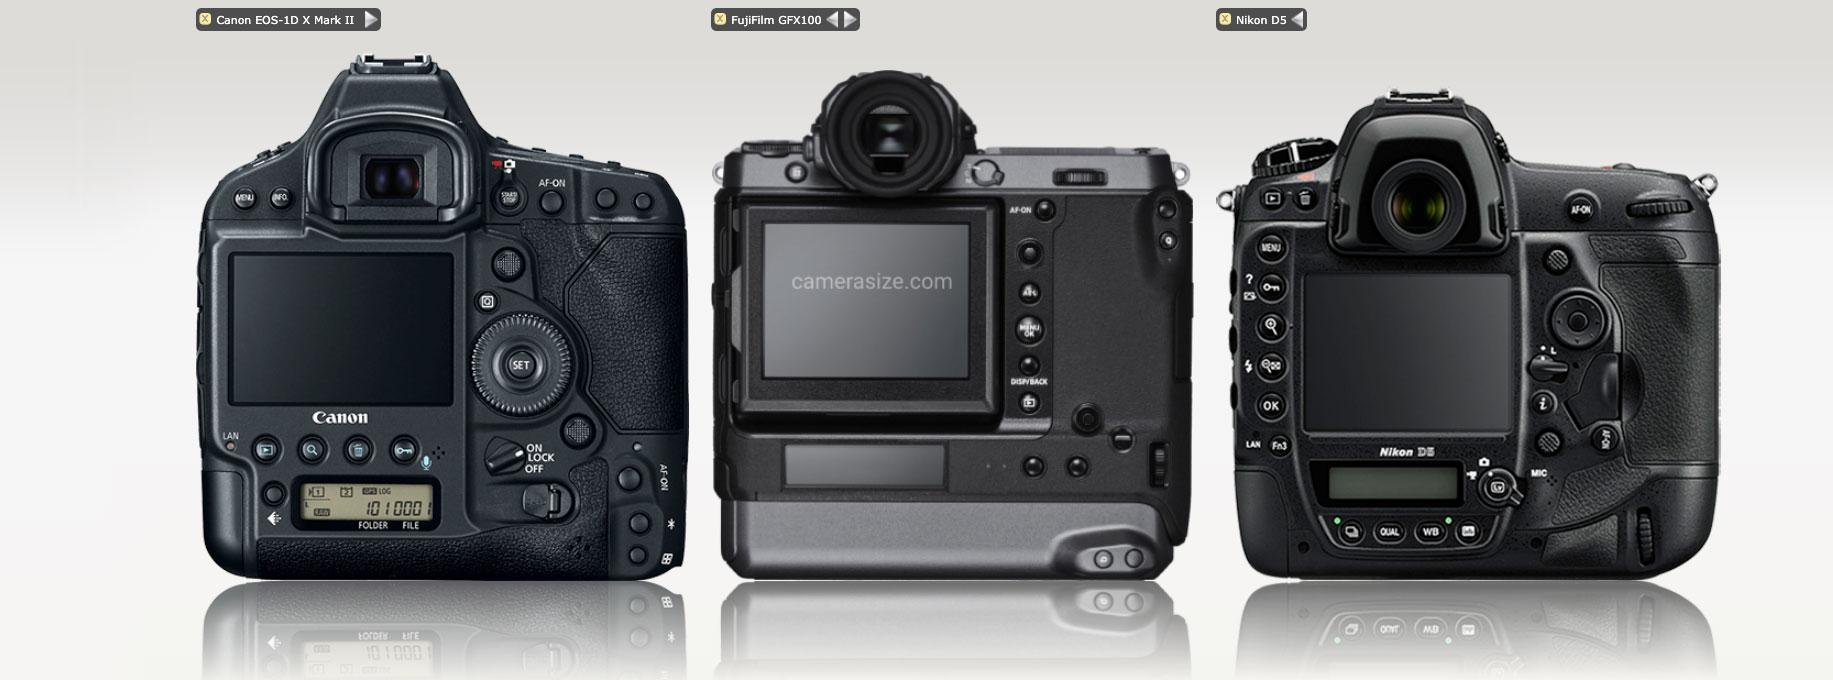 1DX-GFX100-D5-sau.jpg